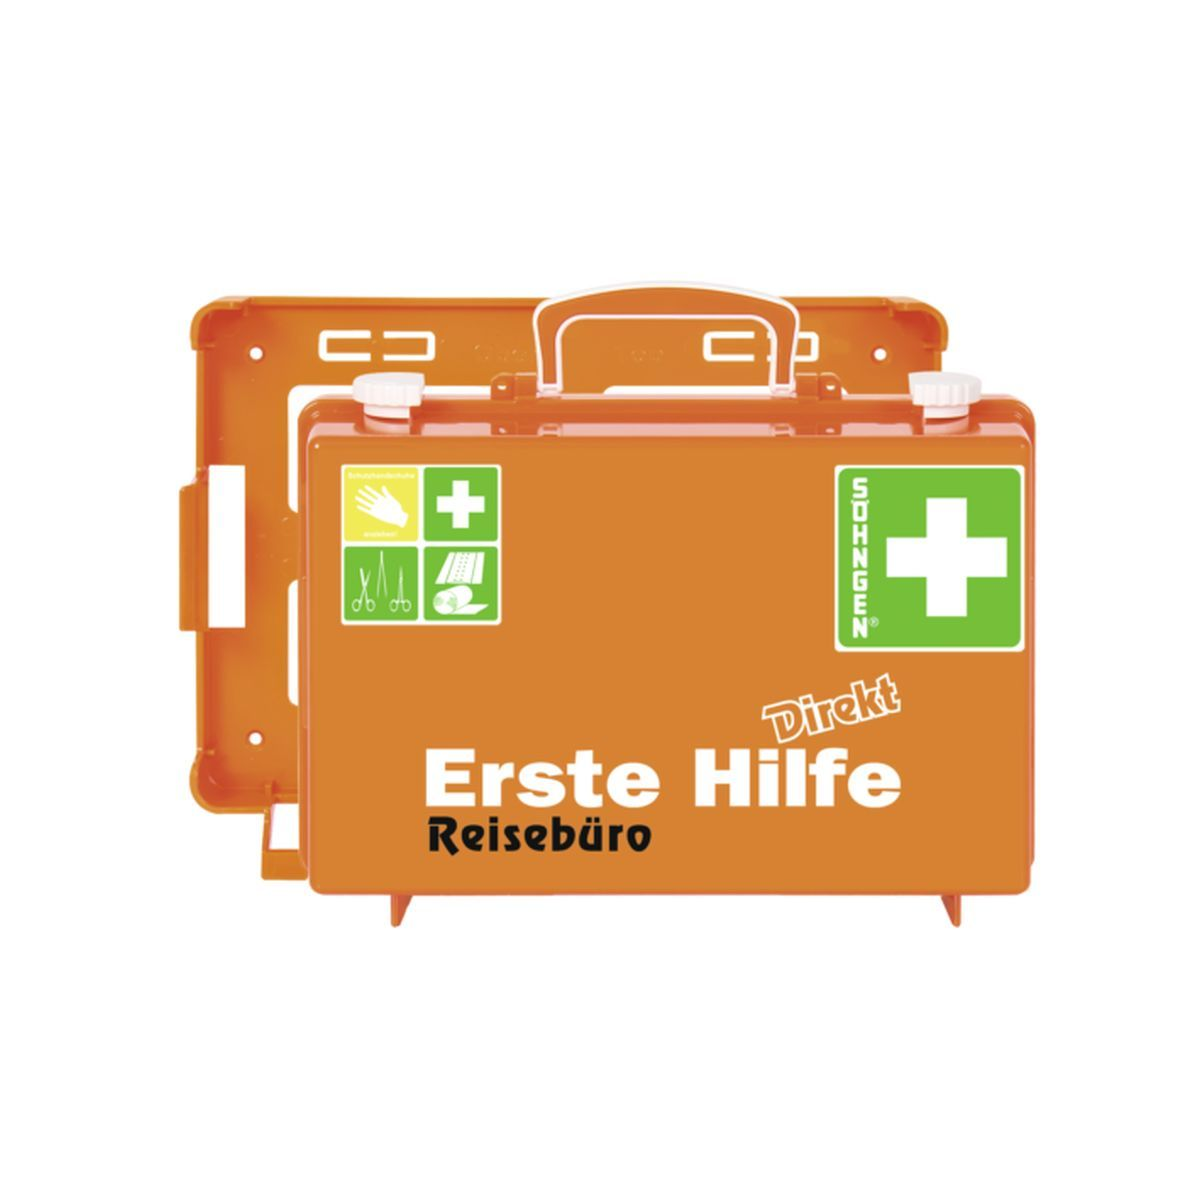 Erste Hilfe Koffer DIN 13157 DIREKT, Reisebüro